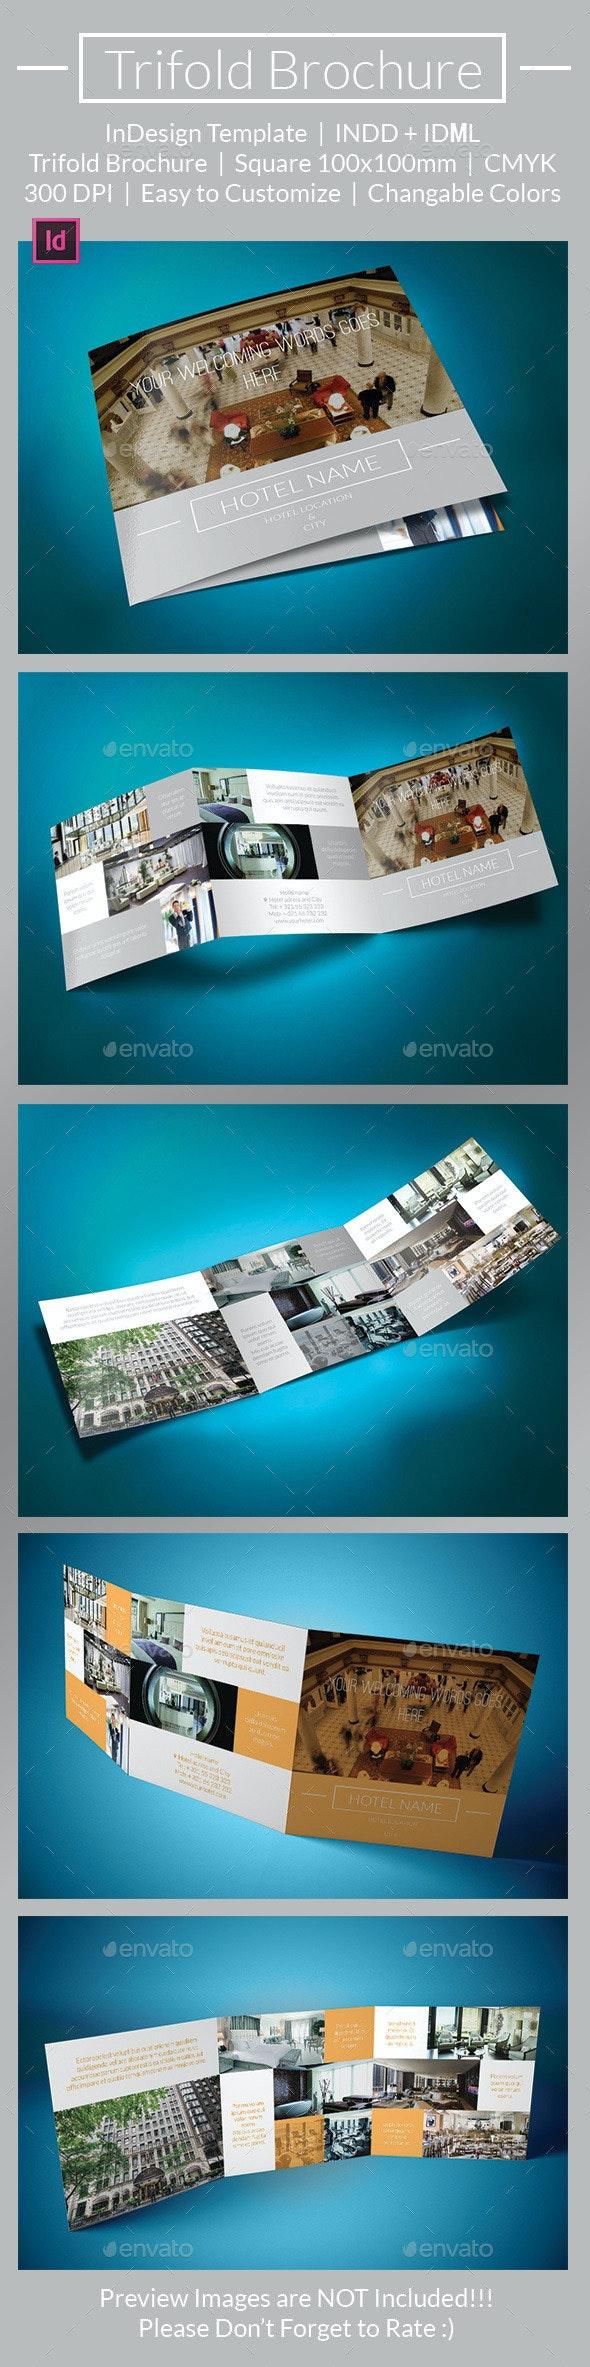 Hotel Metro Trifold Brochure - Brochures Print Templates